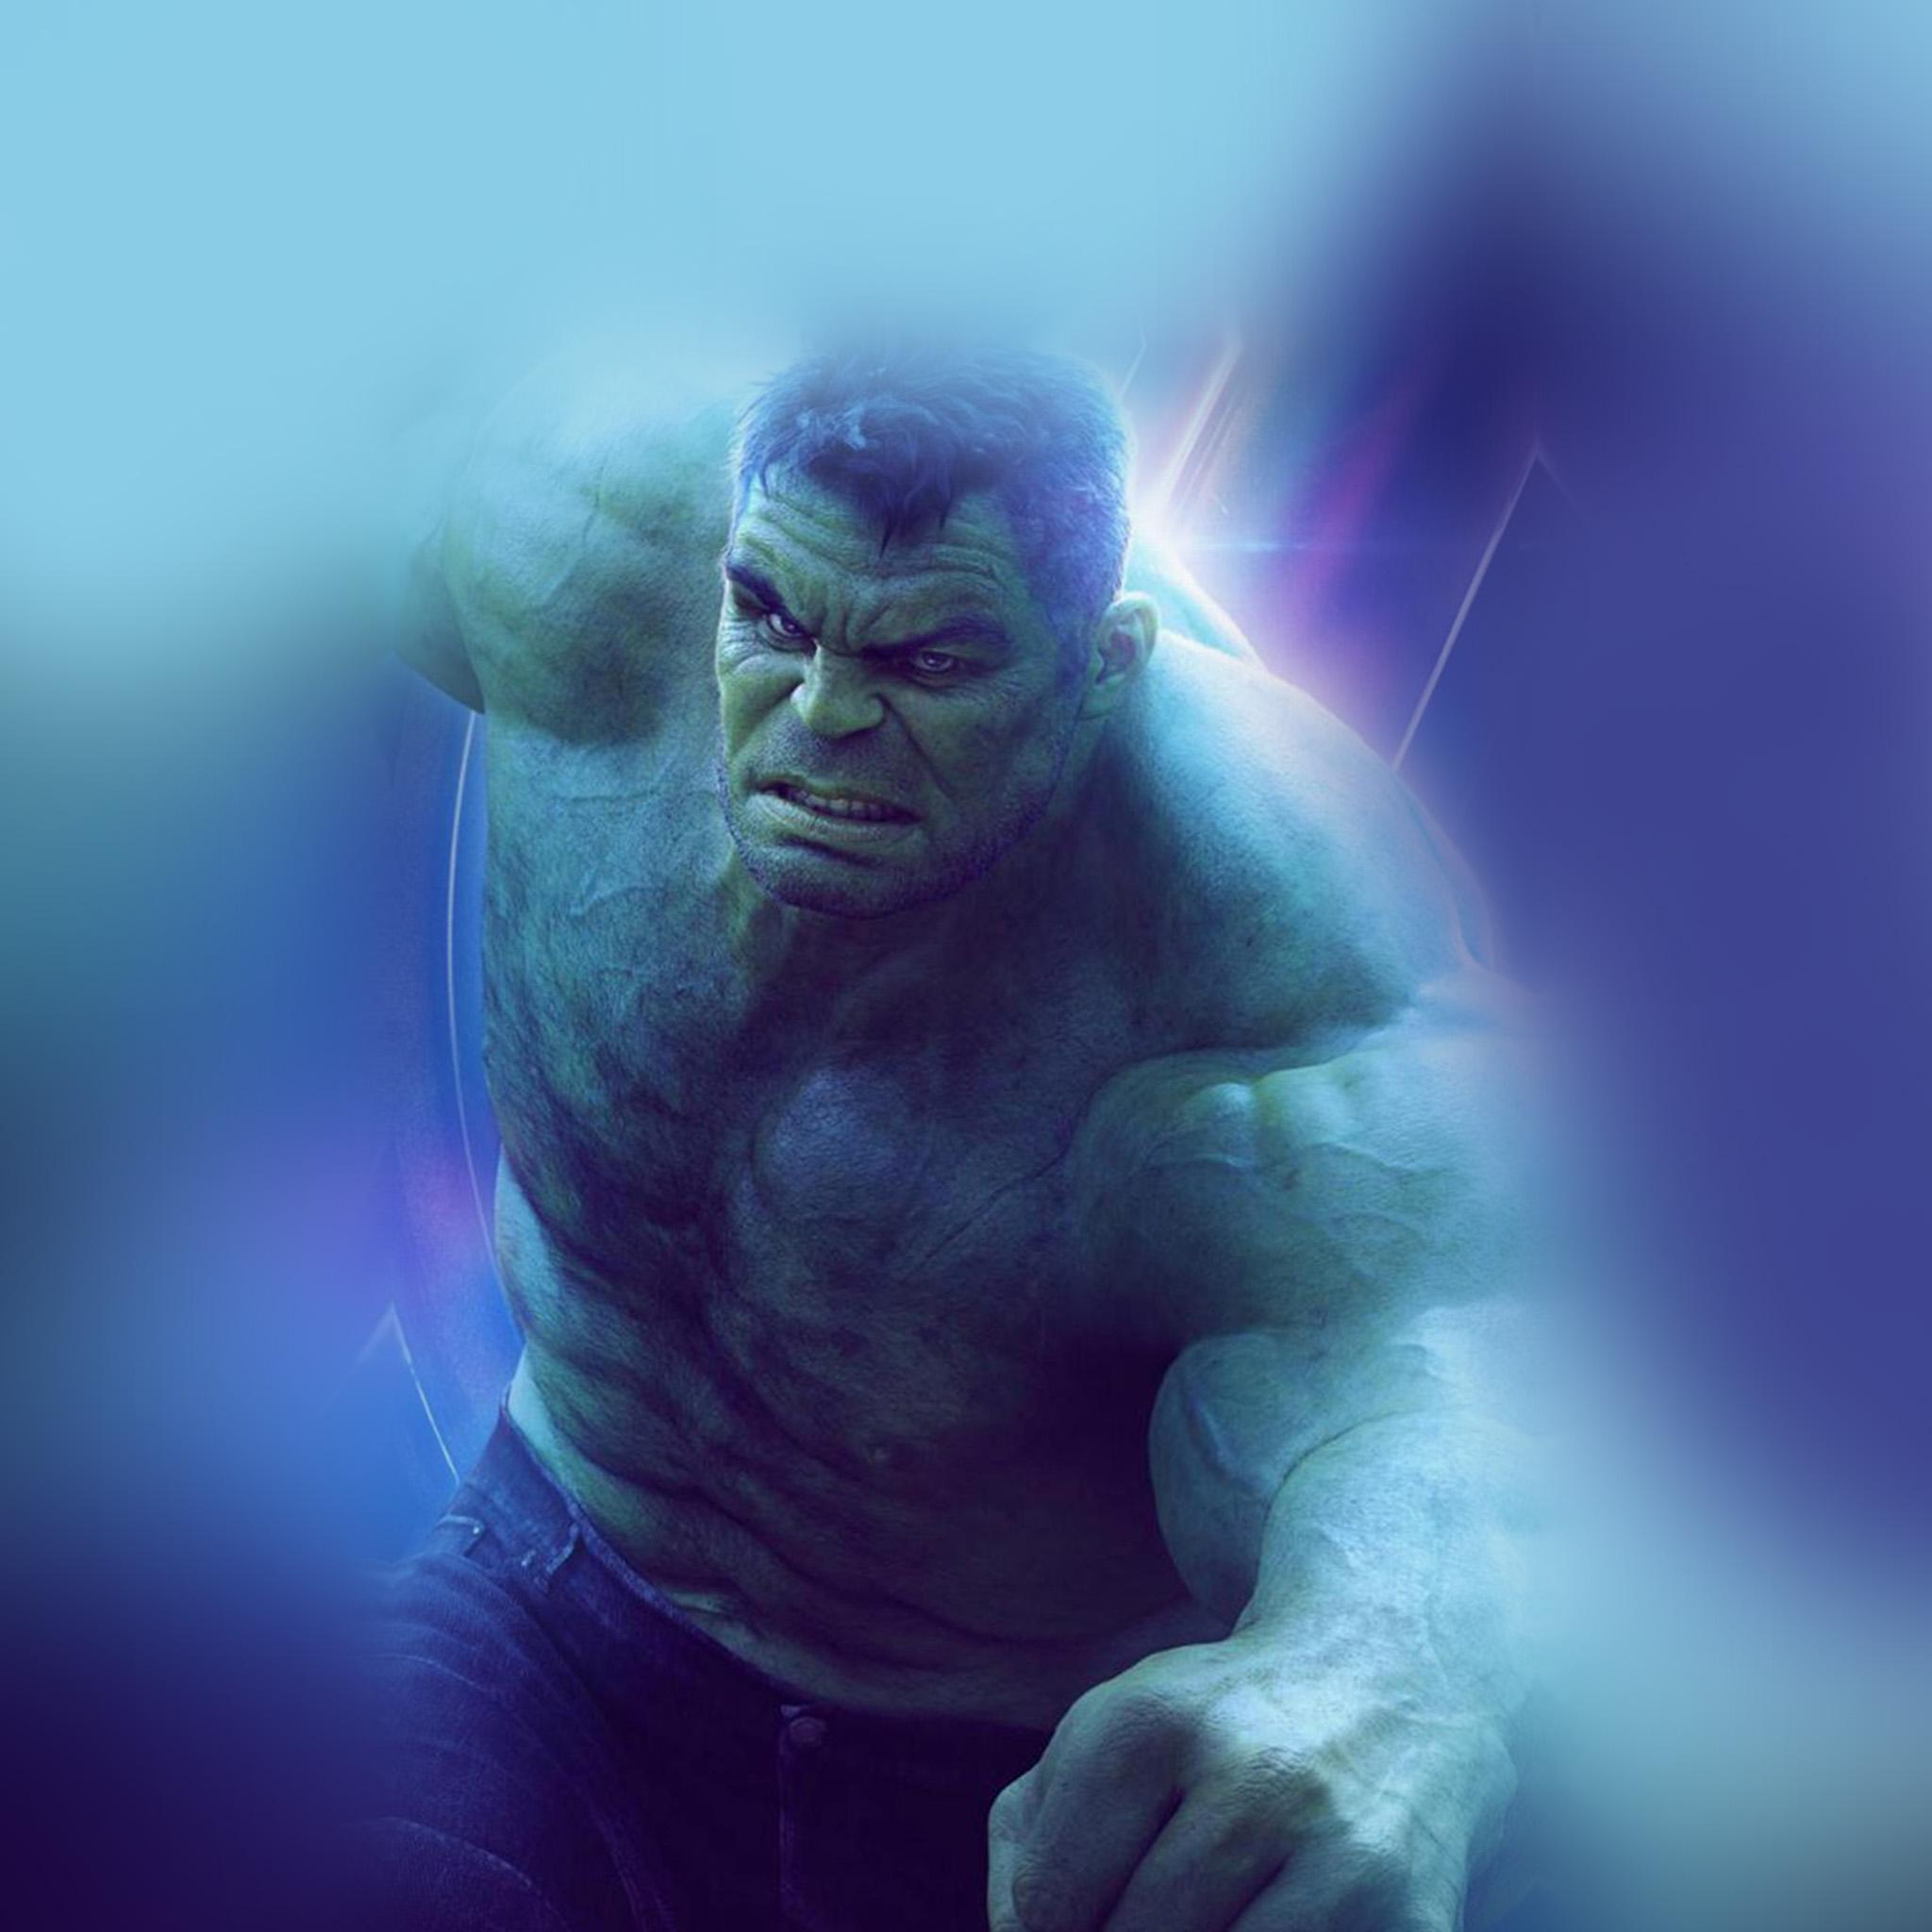 Wallpaper Iphone Superhero: Be88-hulk-avengers-hero